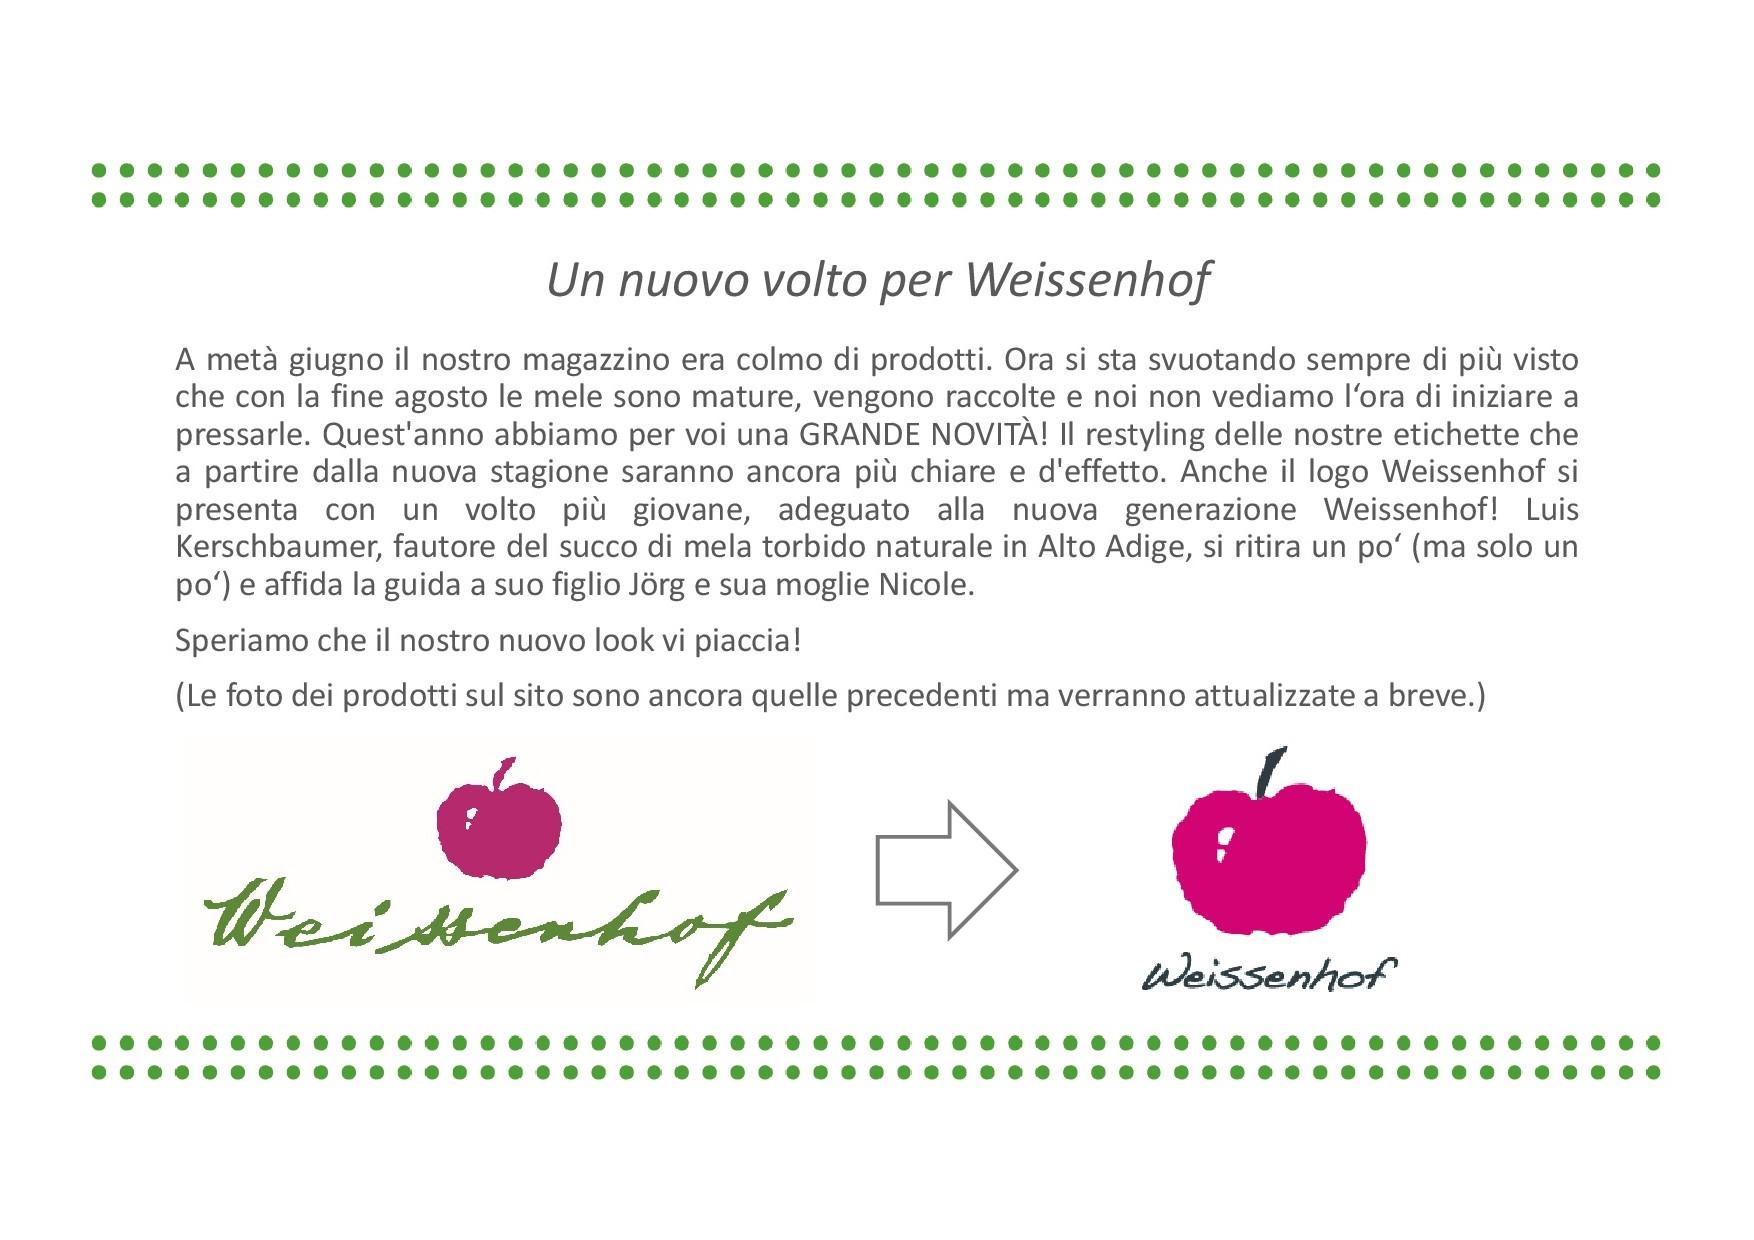 2018-08-07_Weissenhof neuer Look_ita (1)